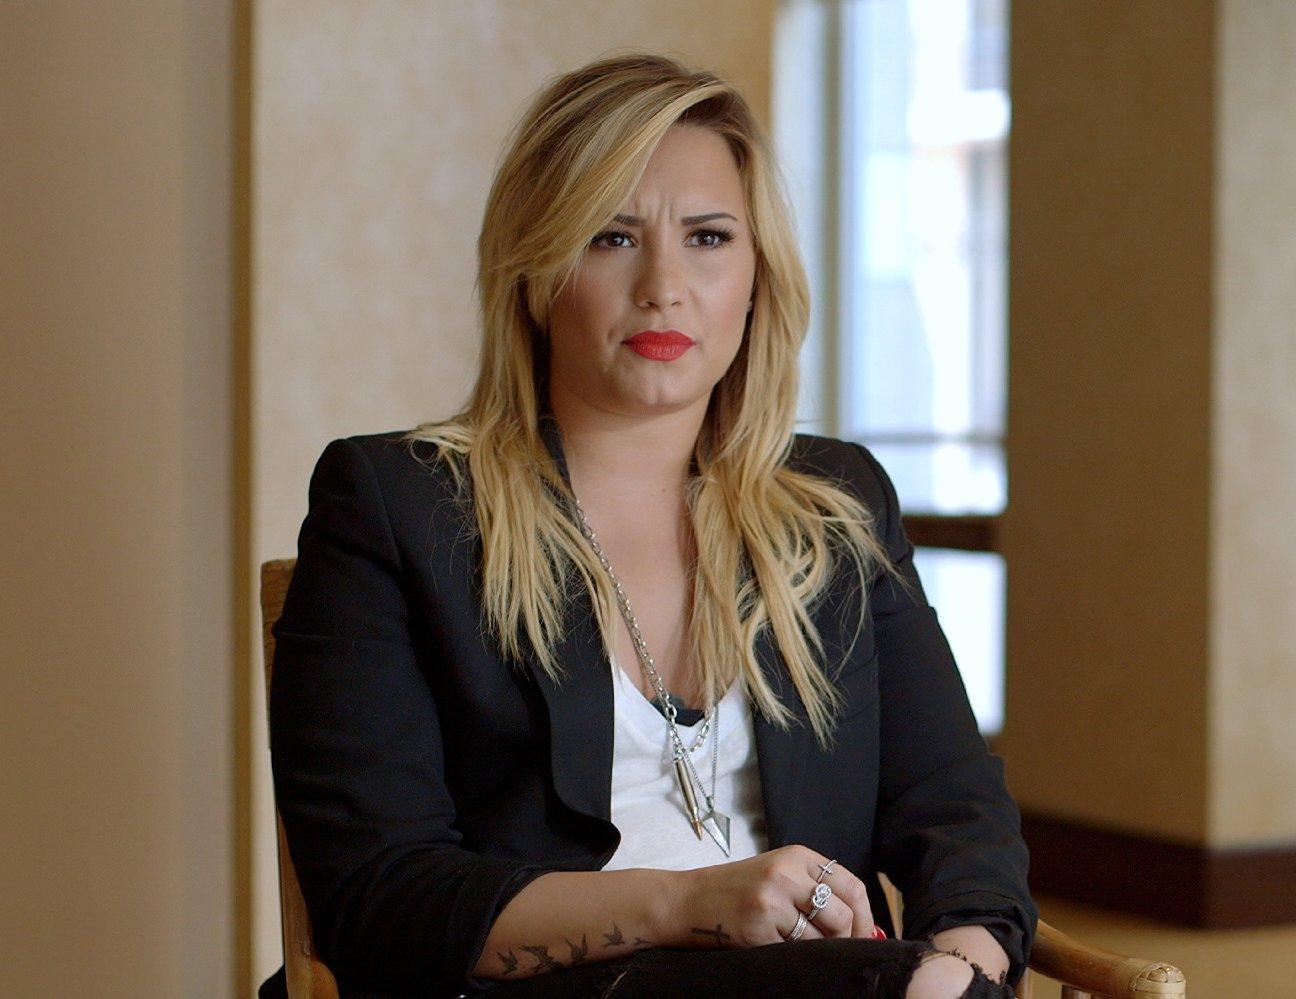 All Movies & TV Shows Where Demi Lovato Starred - Gomovies